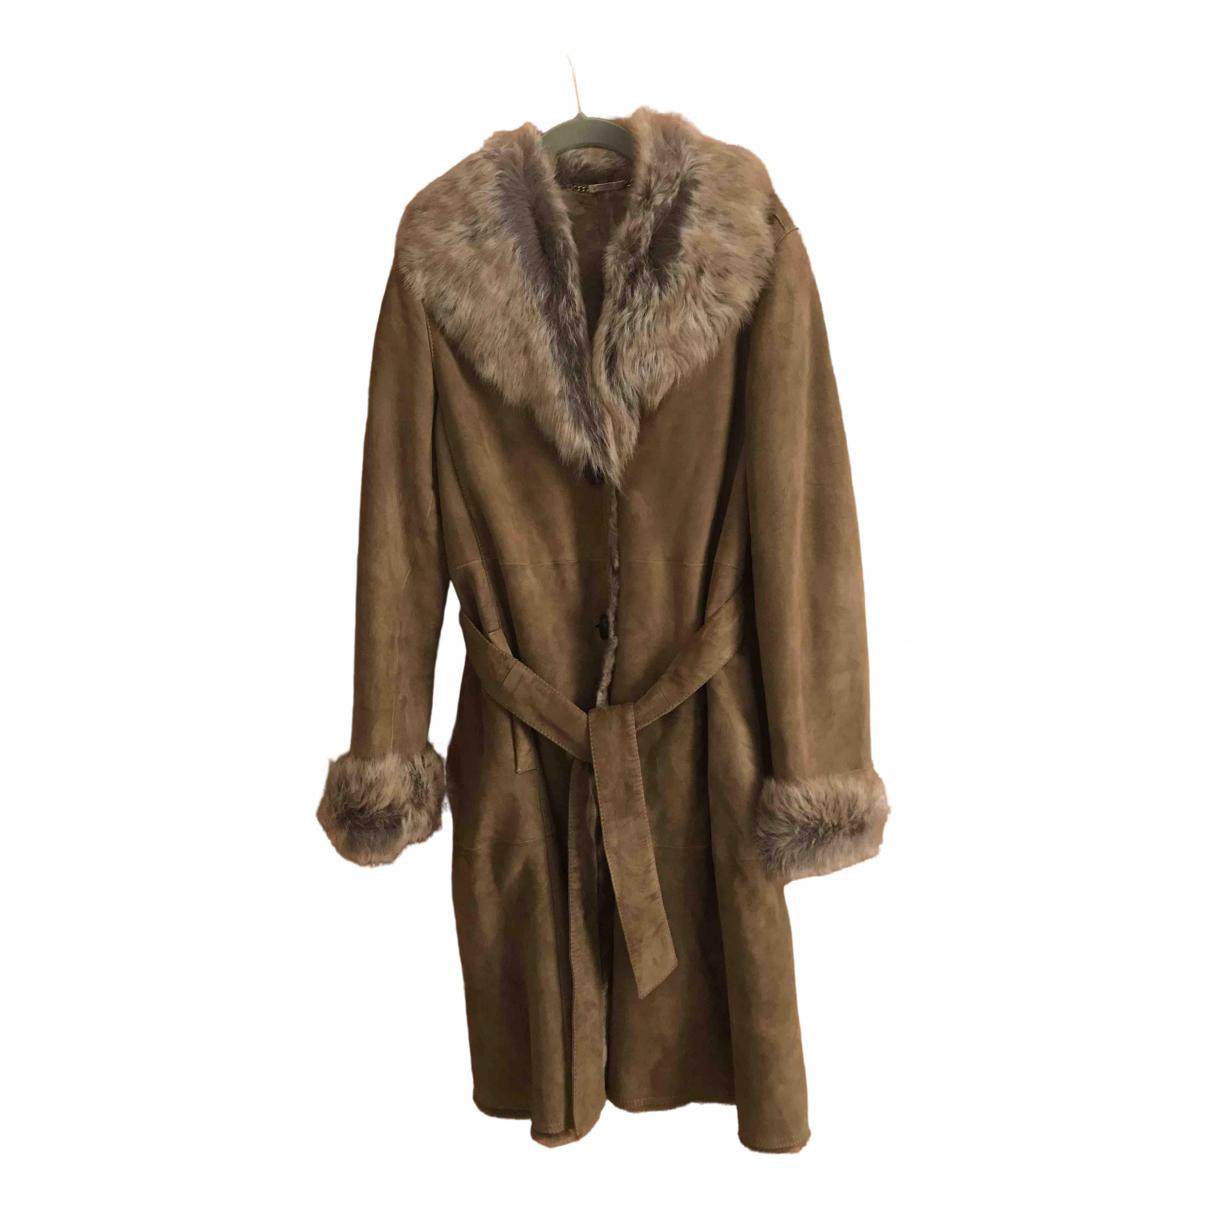 Massimo Dutti \N Beige Shearling coat for Women 34 FR